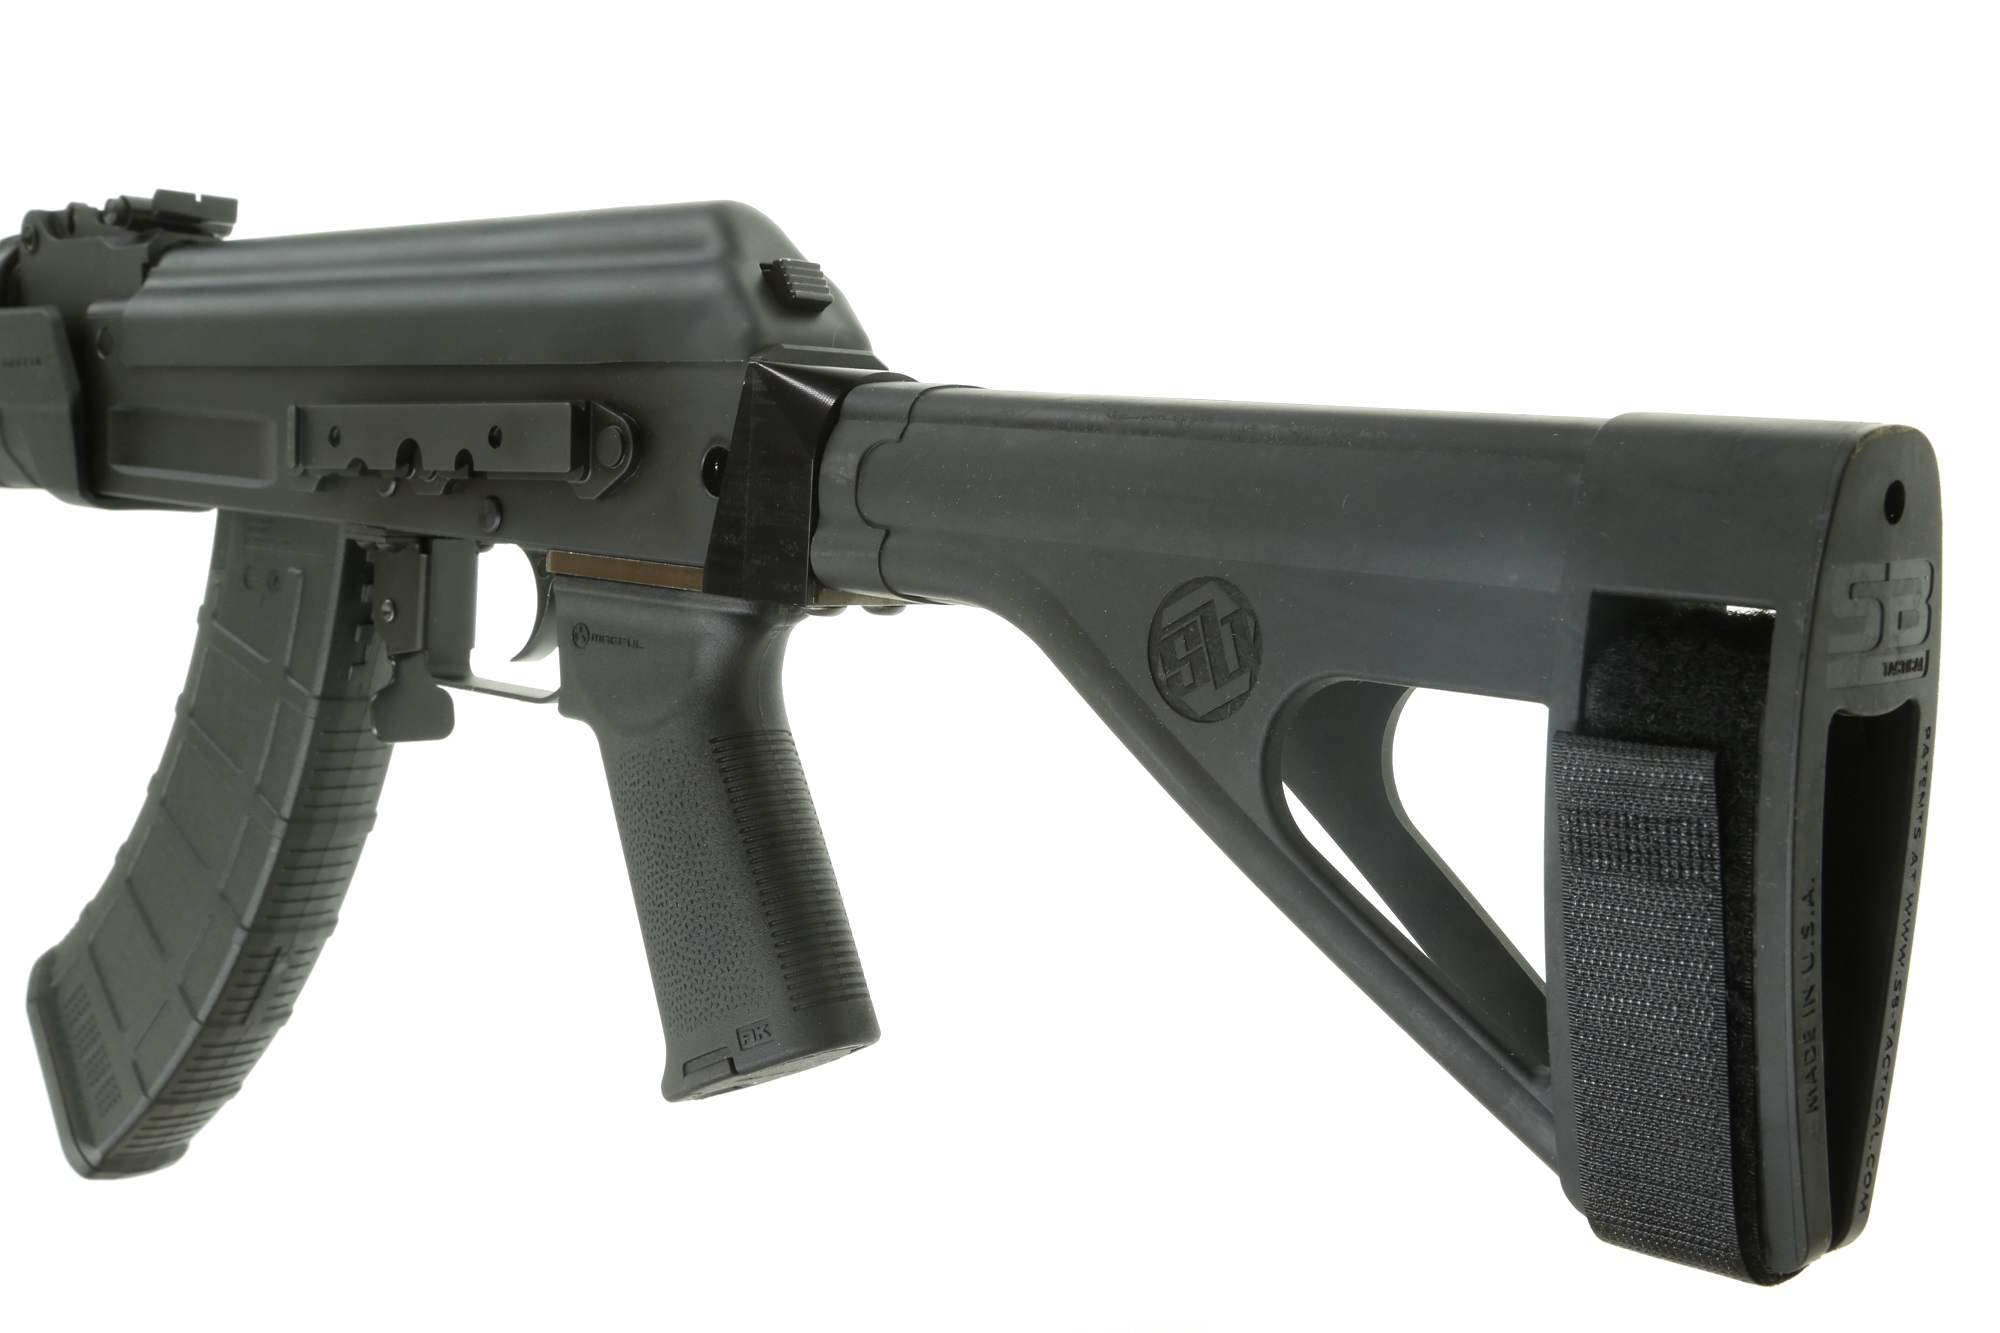 Century C39V2 7 62x39 AK Pistol 10 6'' barrel w/ Magpul MOE Grip, MOE  Handguard & installed SB Tactical SOB47 Arm Brace (1) 30rd mag